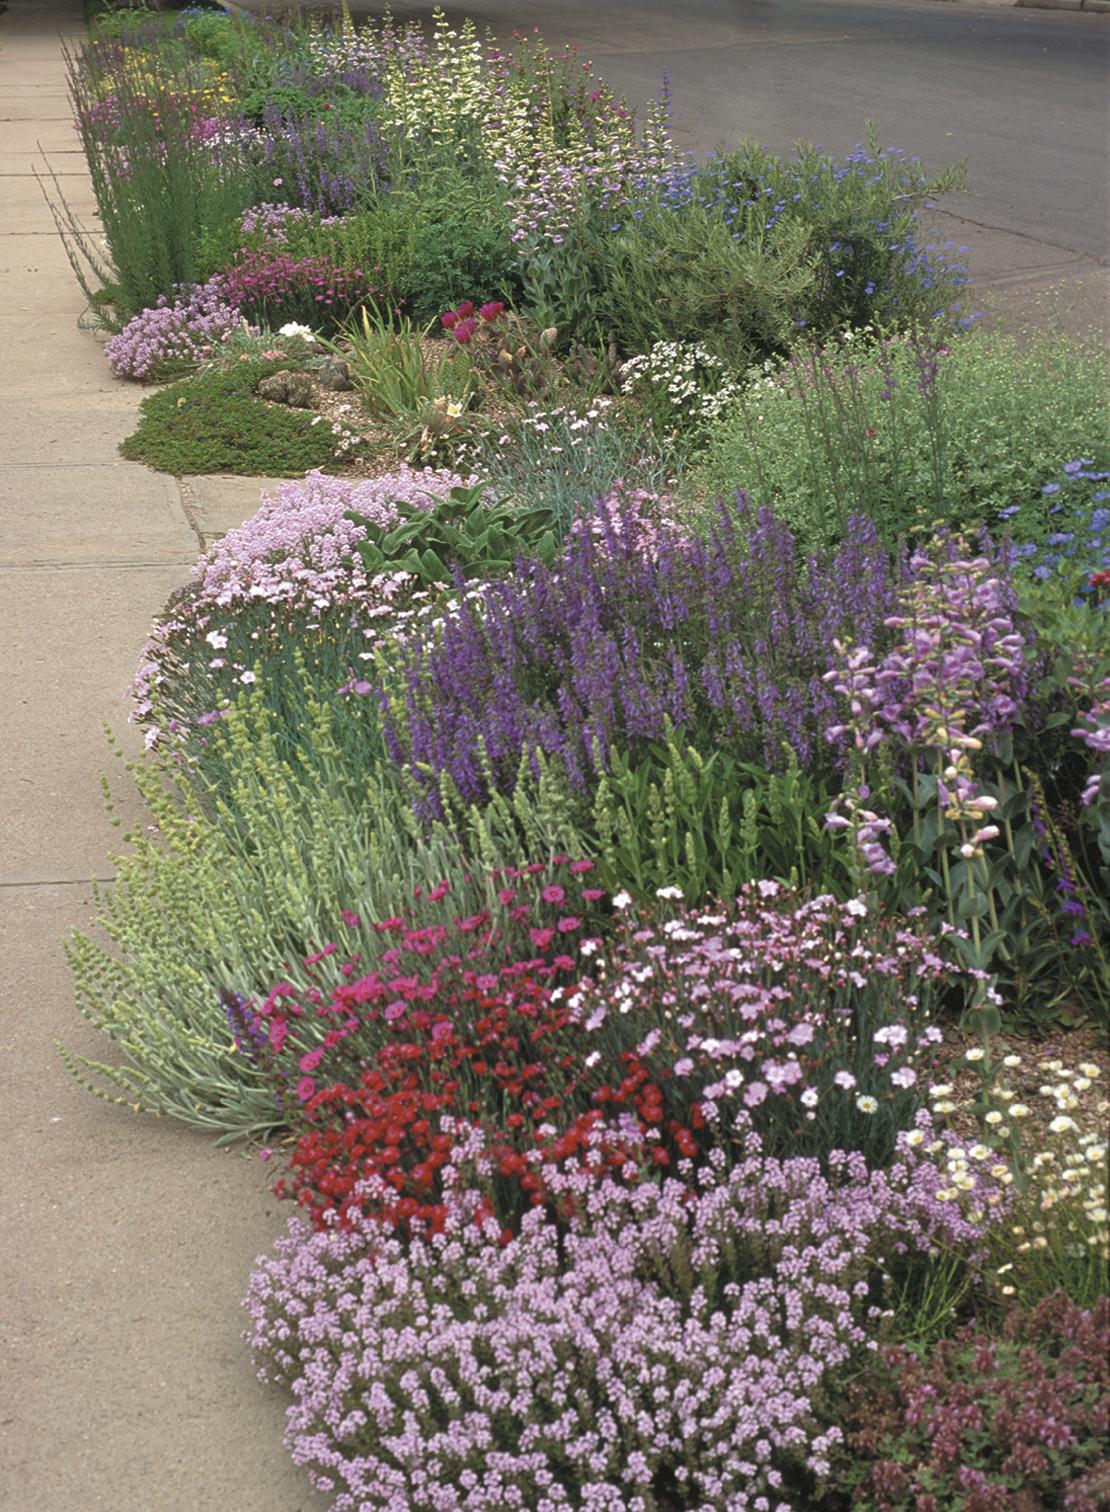 A Pre Planned Garden By Lauren Springer Ogden For High Country Gardens.